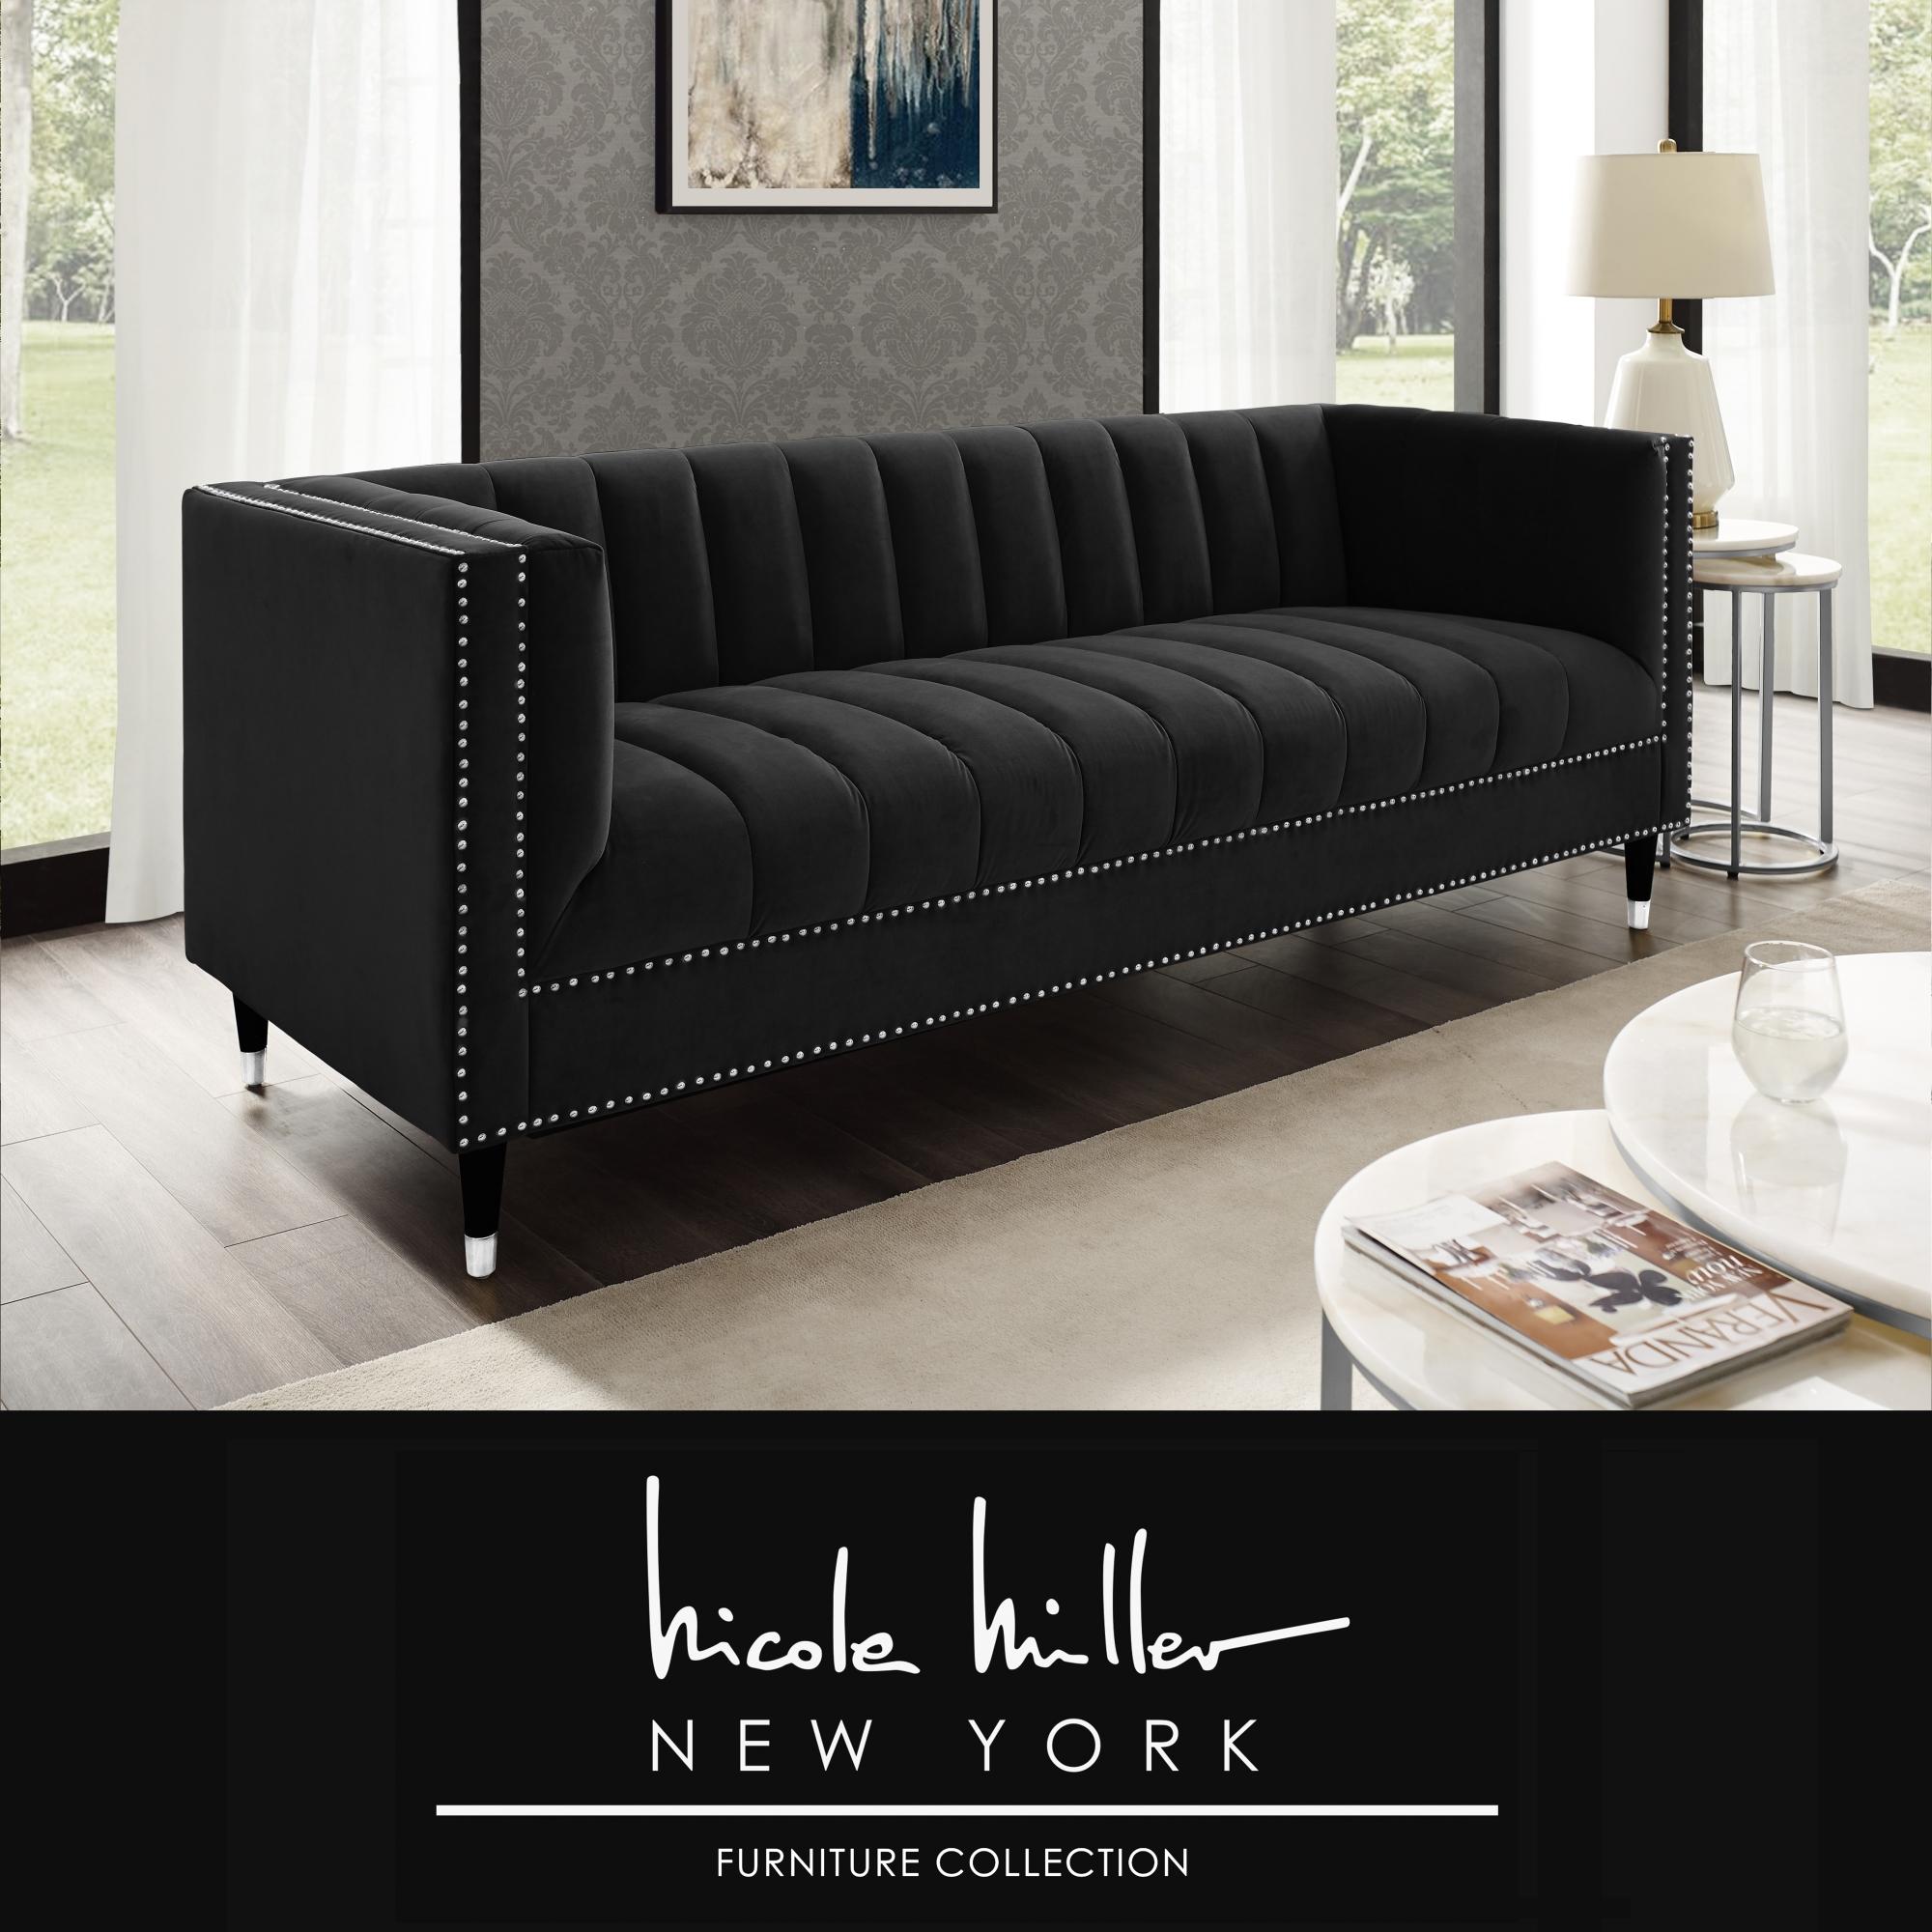 Nicole Miller Black/Chrome Velvet Sofa Line Stitch Tufted Chrome Nailhead Trim and Tapered Chrome Leg Tip